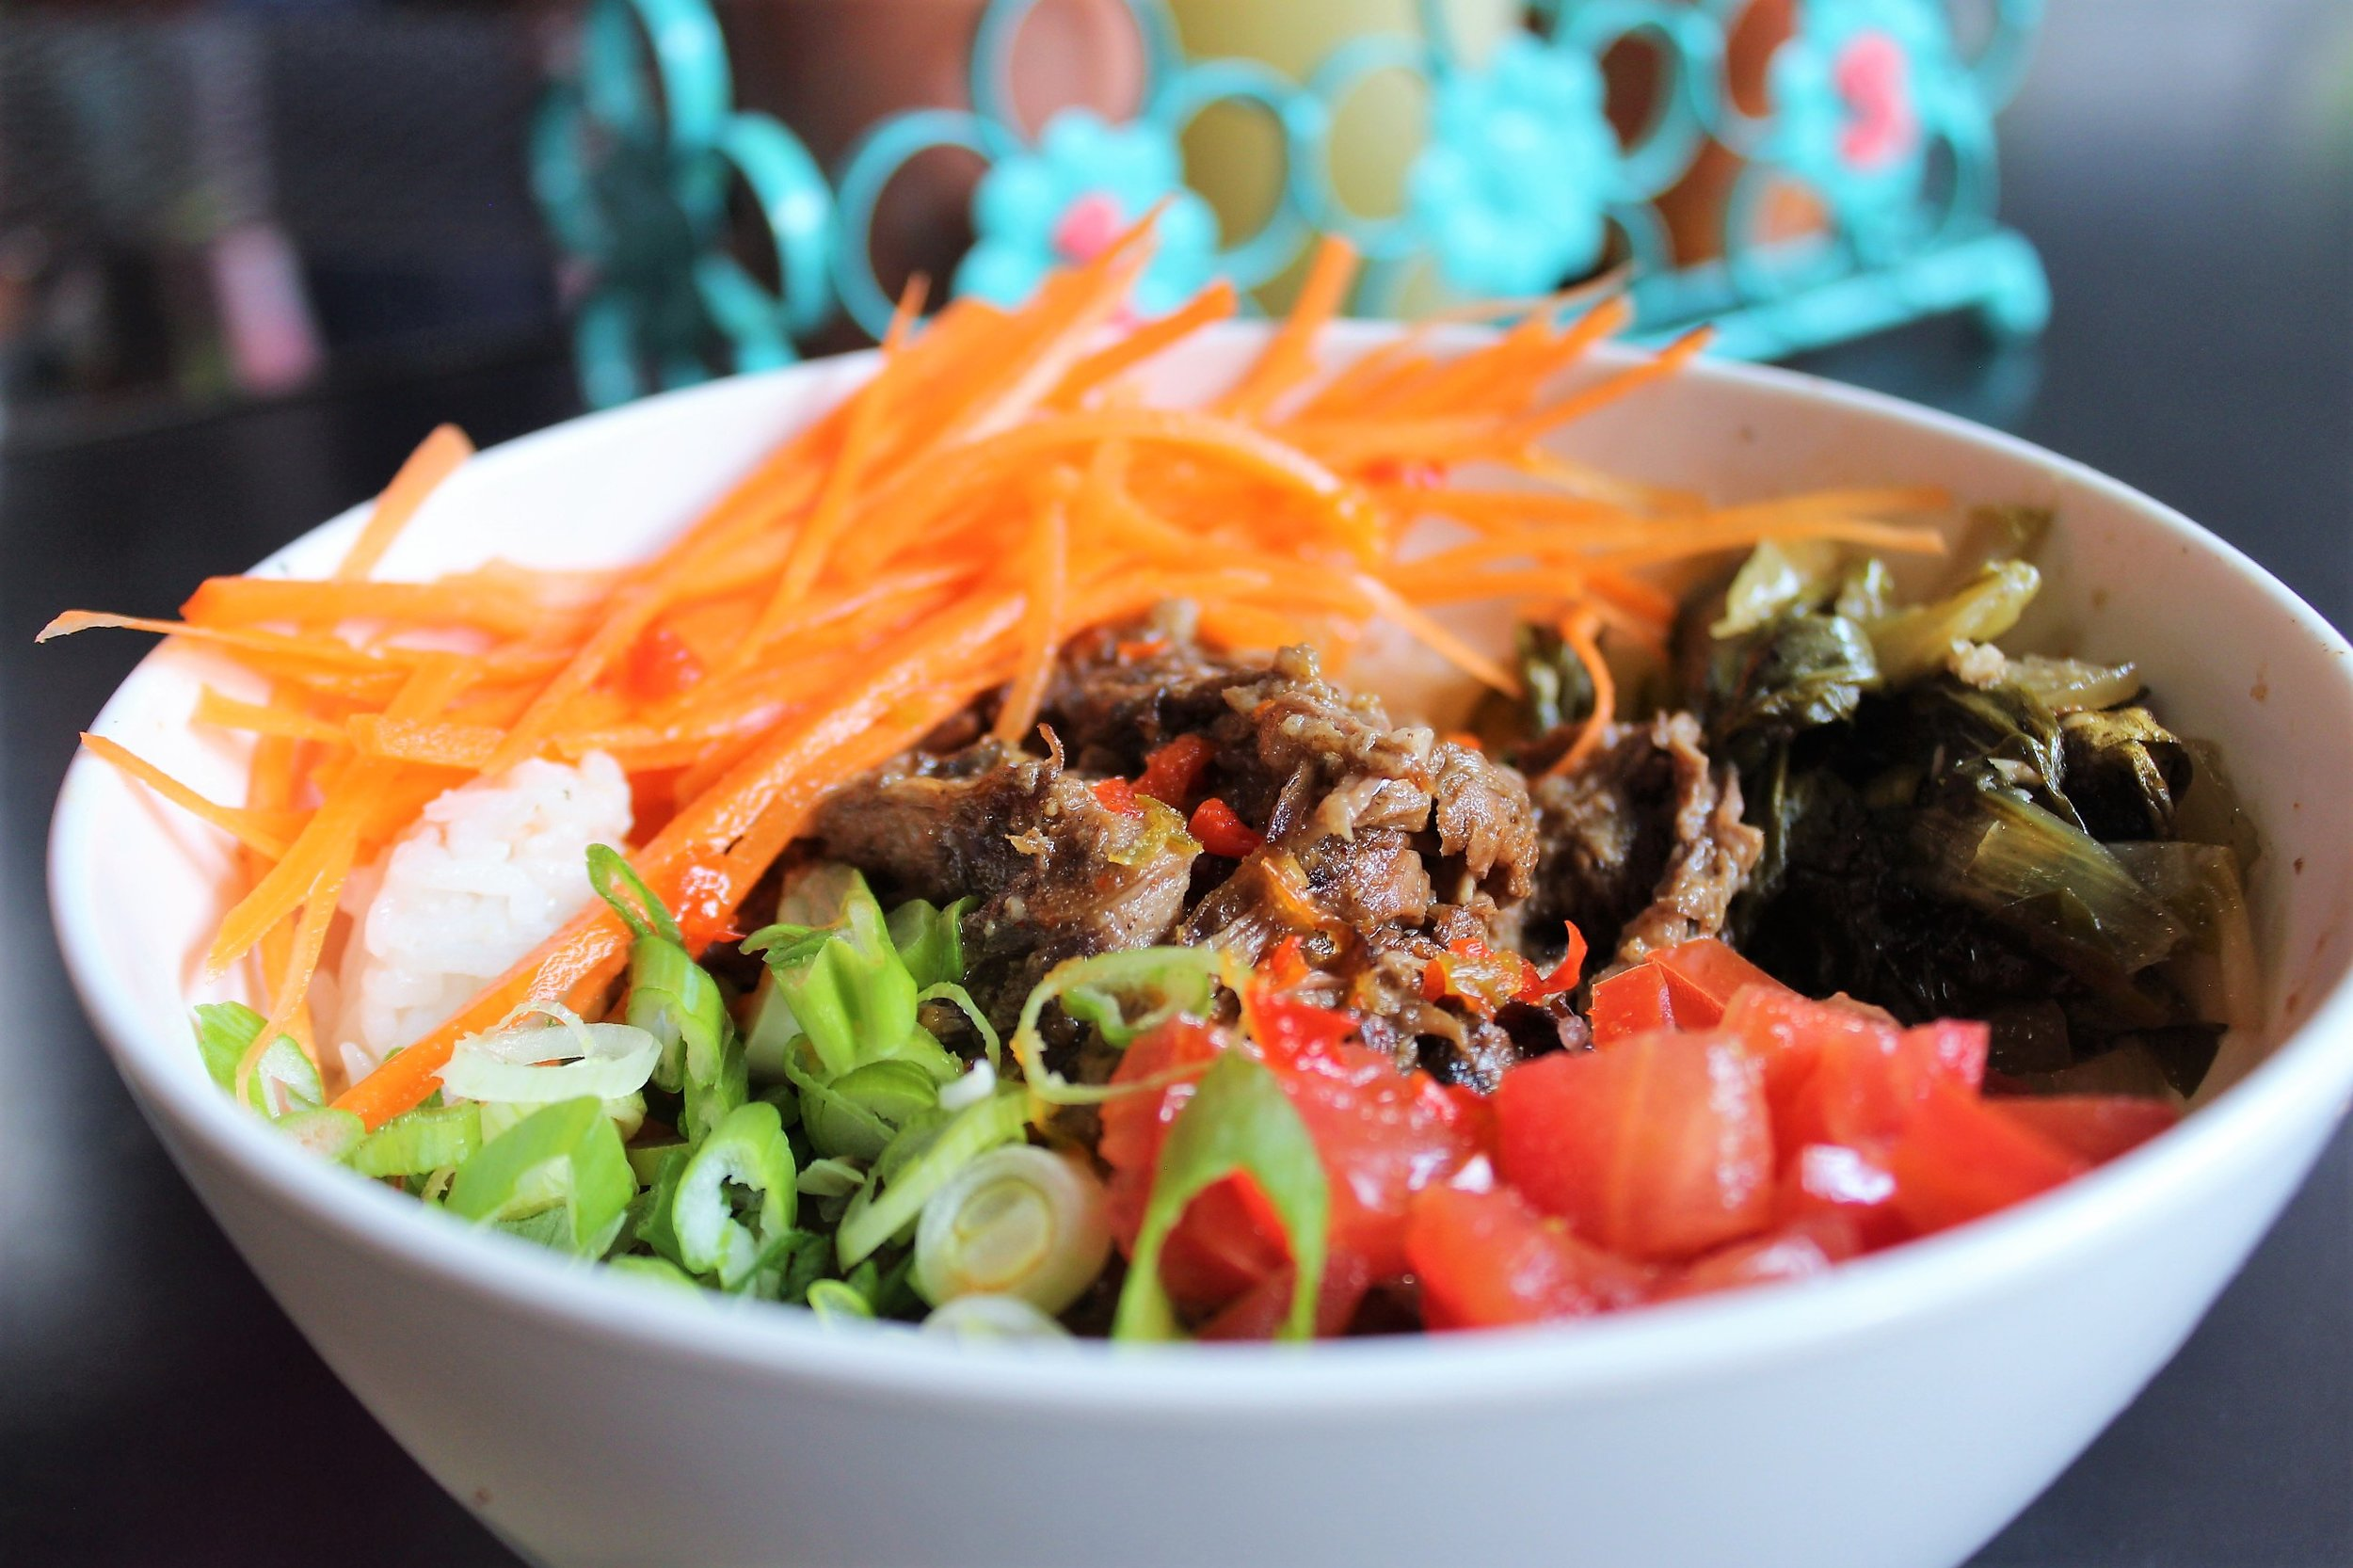 Sinigang Bowl with Short Rib, Garlic Fried Rice, Tomatoes, Carrots, and Bok Choy